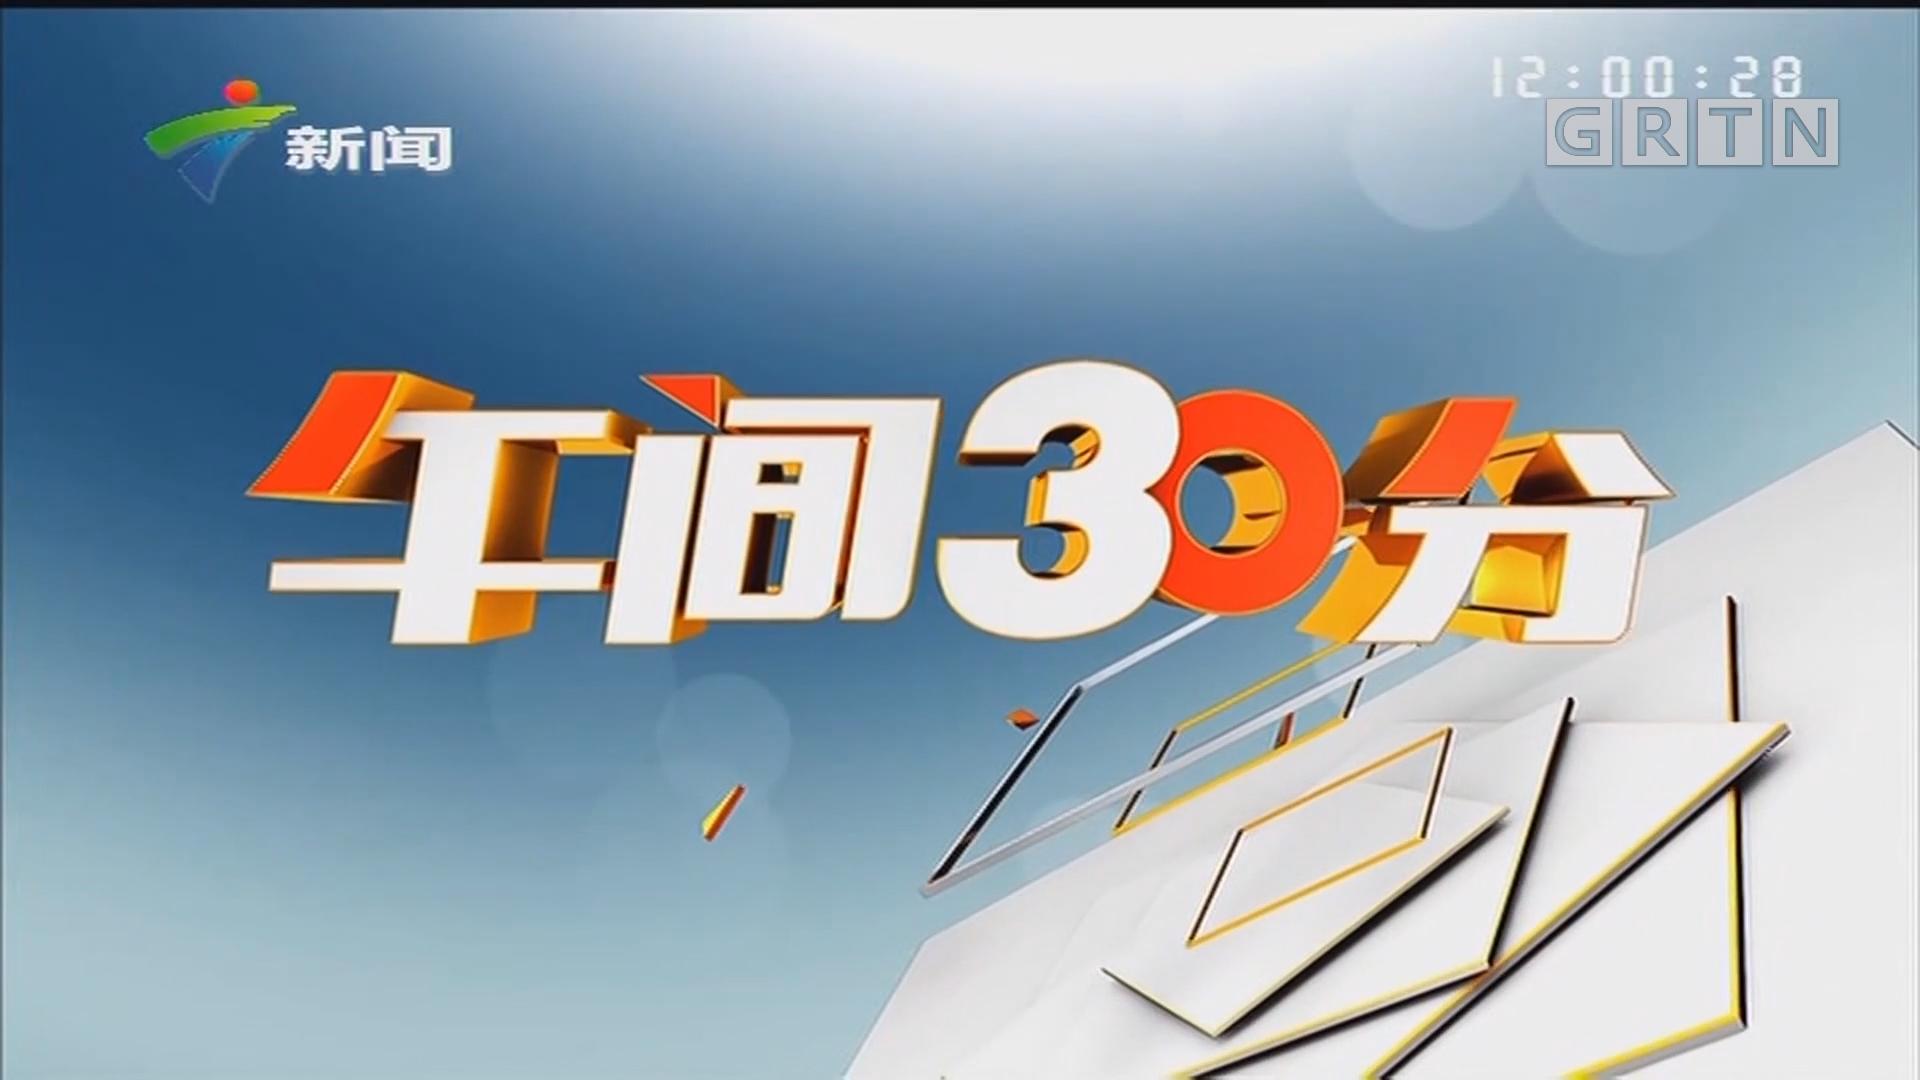 [HD][2019-10-19]午间30分:第七届世界军人运动会在武汉隆重开幕 习近平出席开幕式并宣布运动会开幕